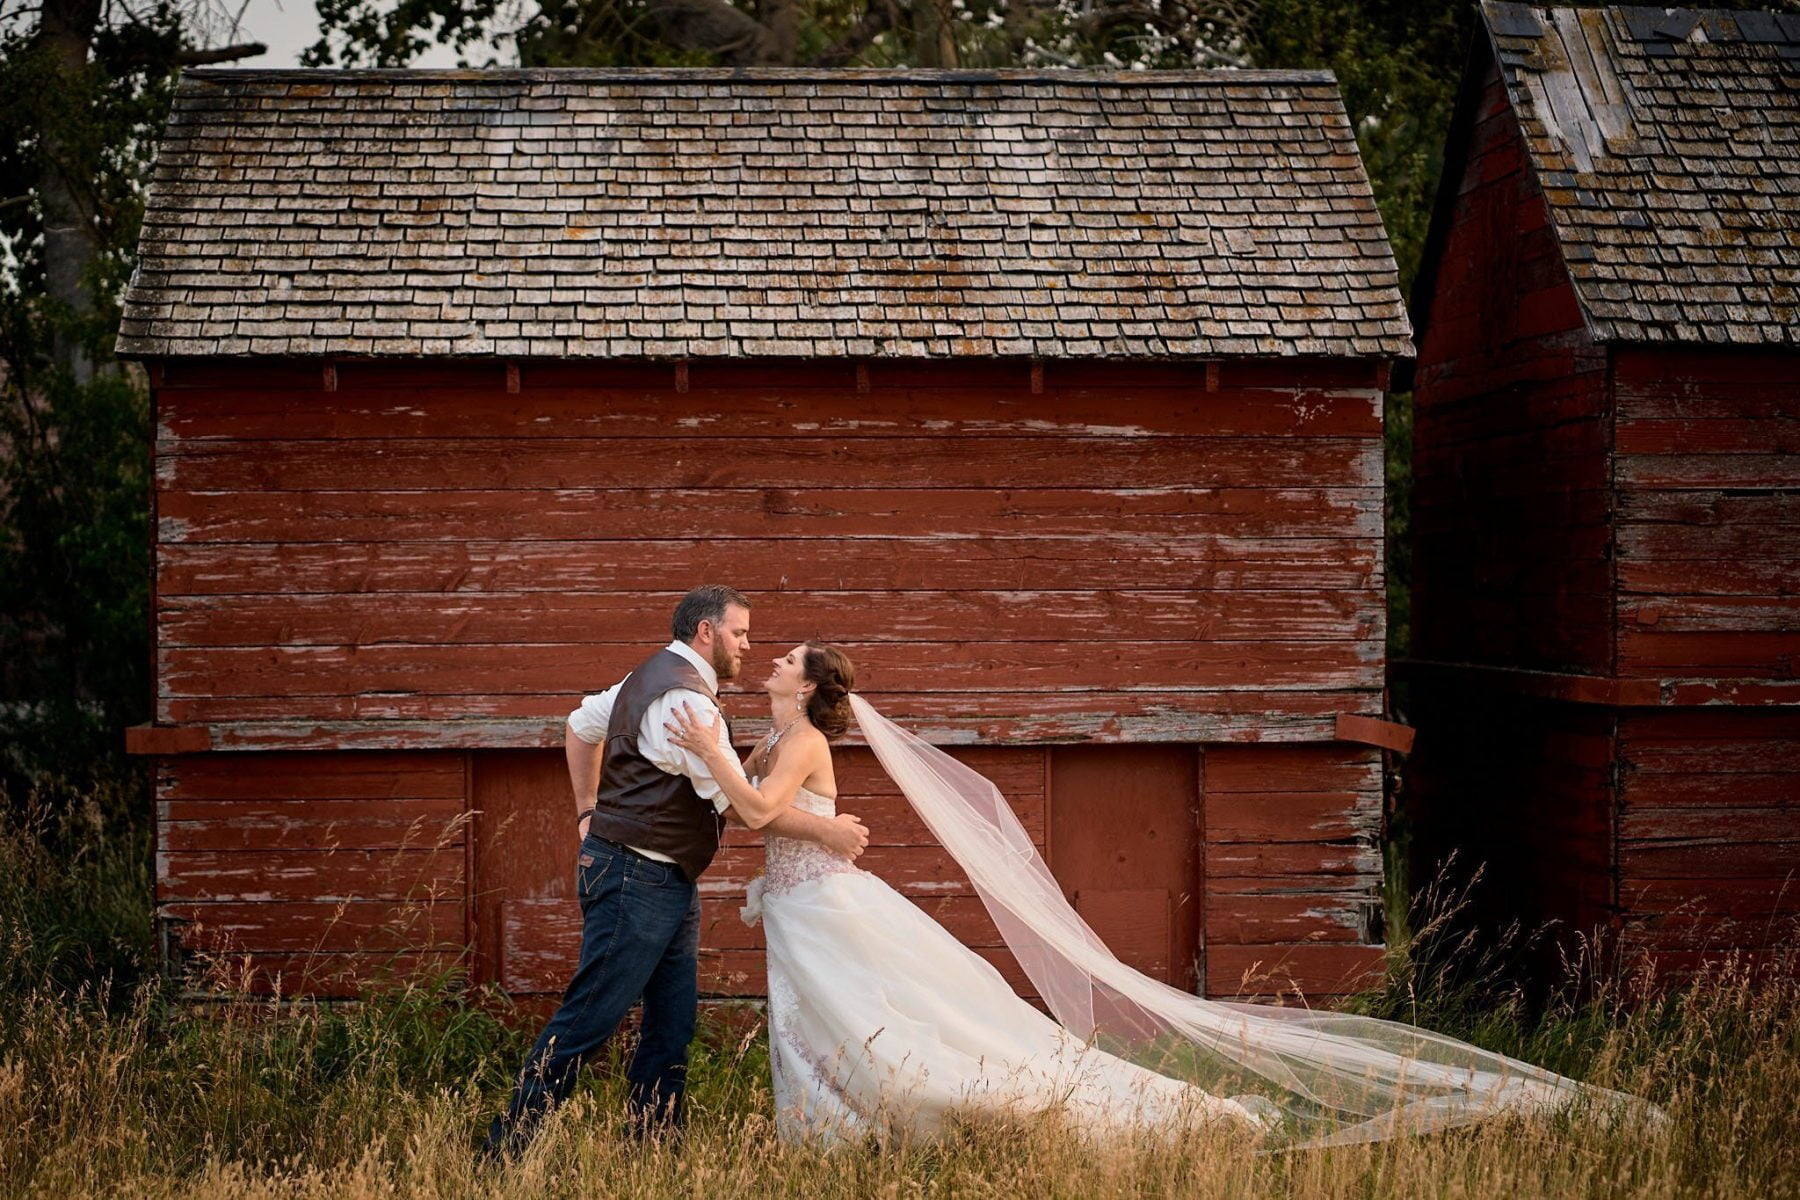 Wedding Photography barn bin rustic country alberta